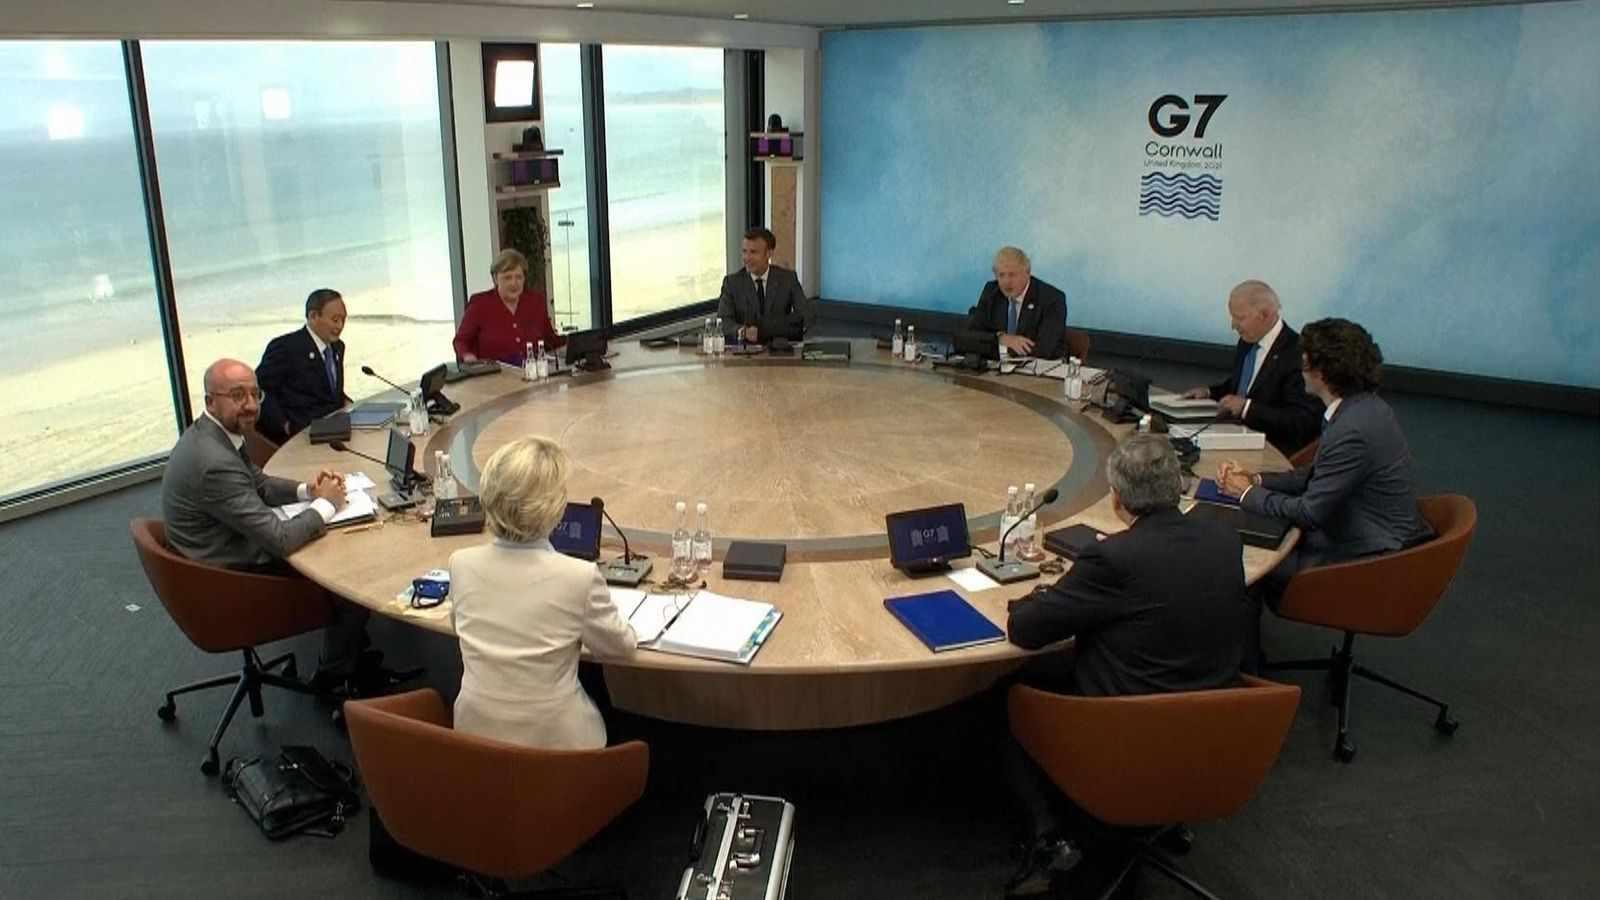 g7 covid mistake financial crash